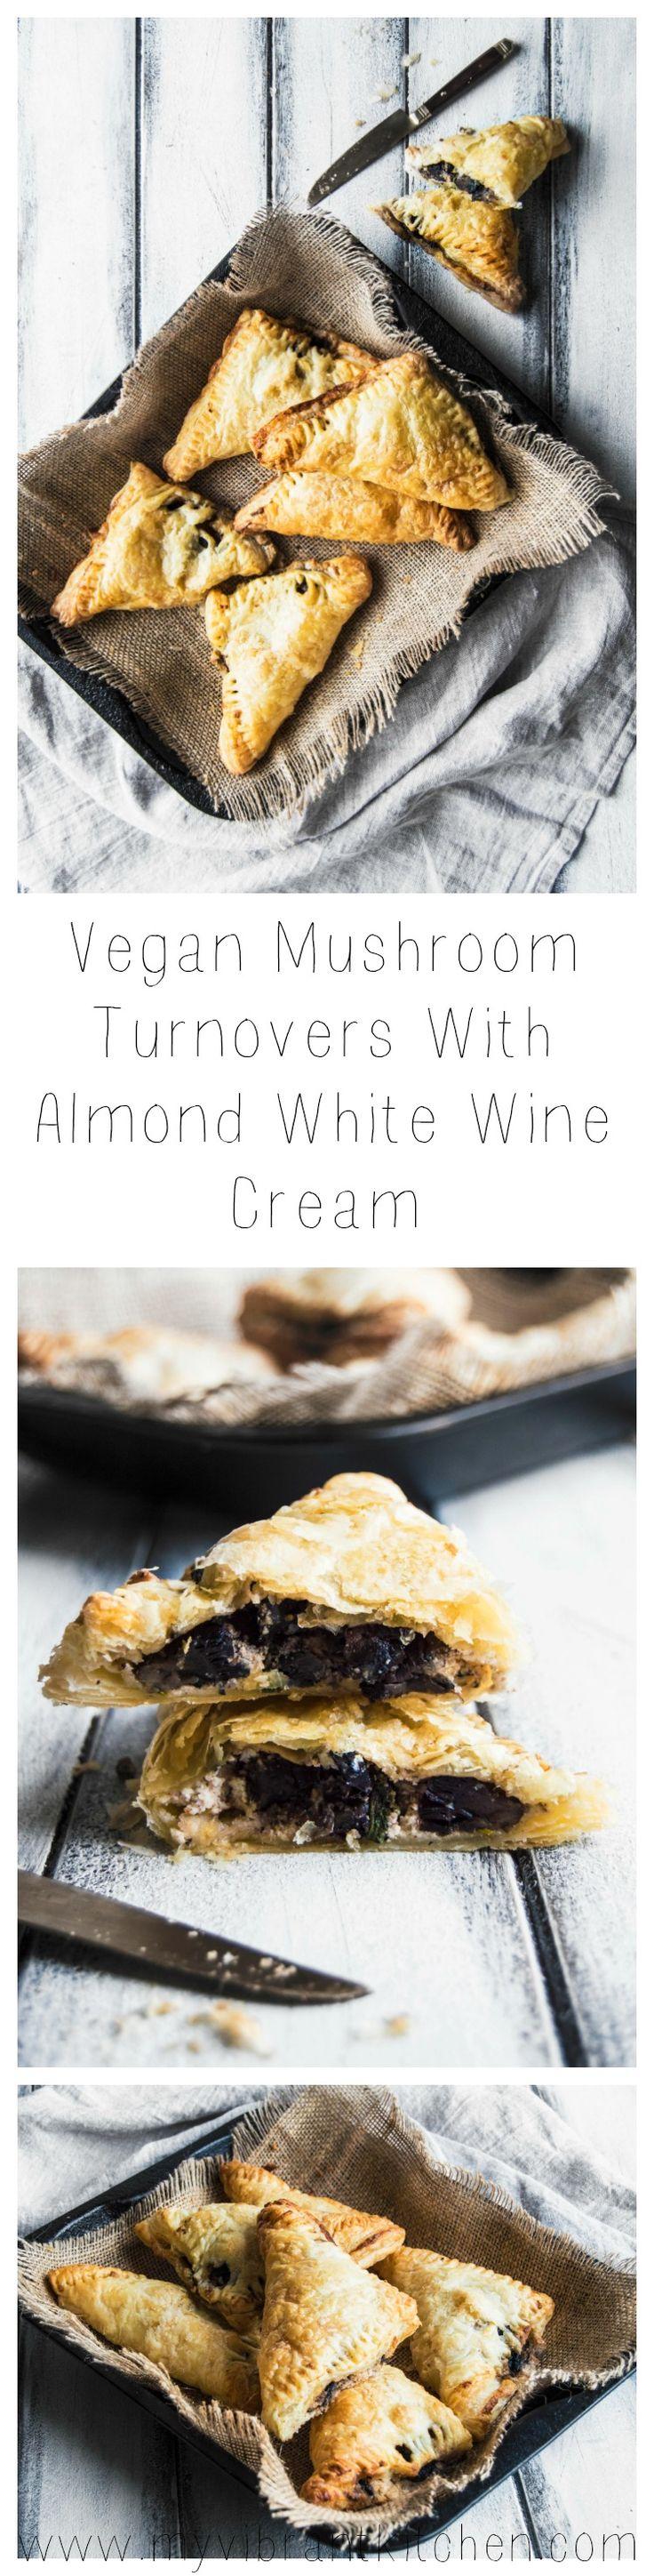 My Vibrant Kitchen   Vegan Sage Mushroom Turnovers With Almond White Wine Cream   myvibrantkitchen.com